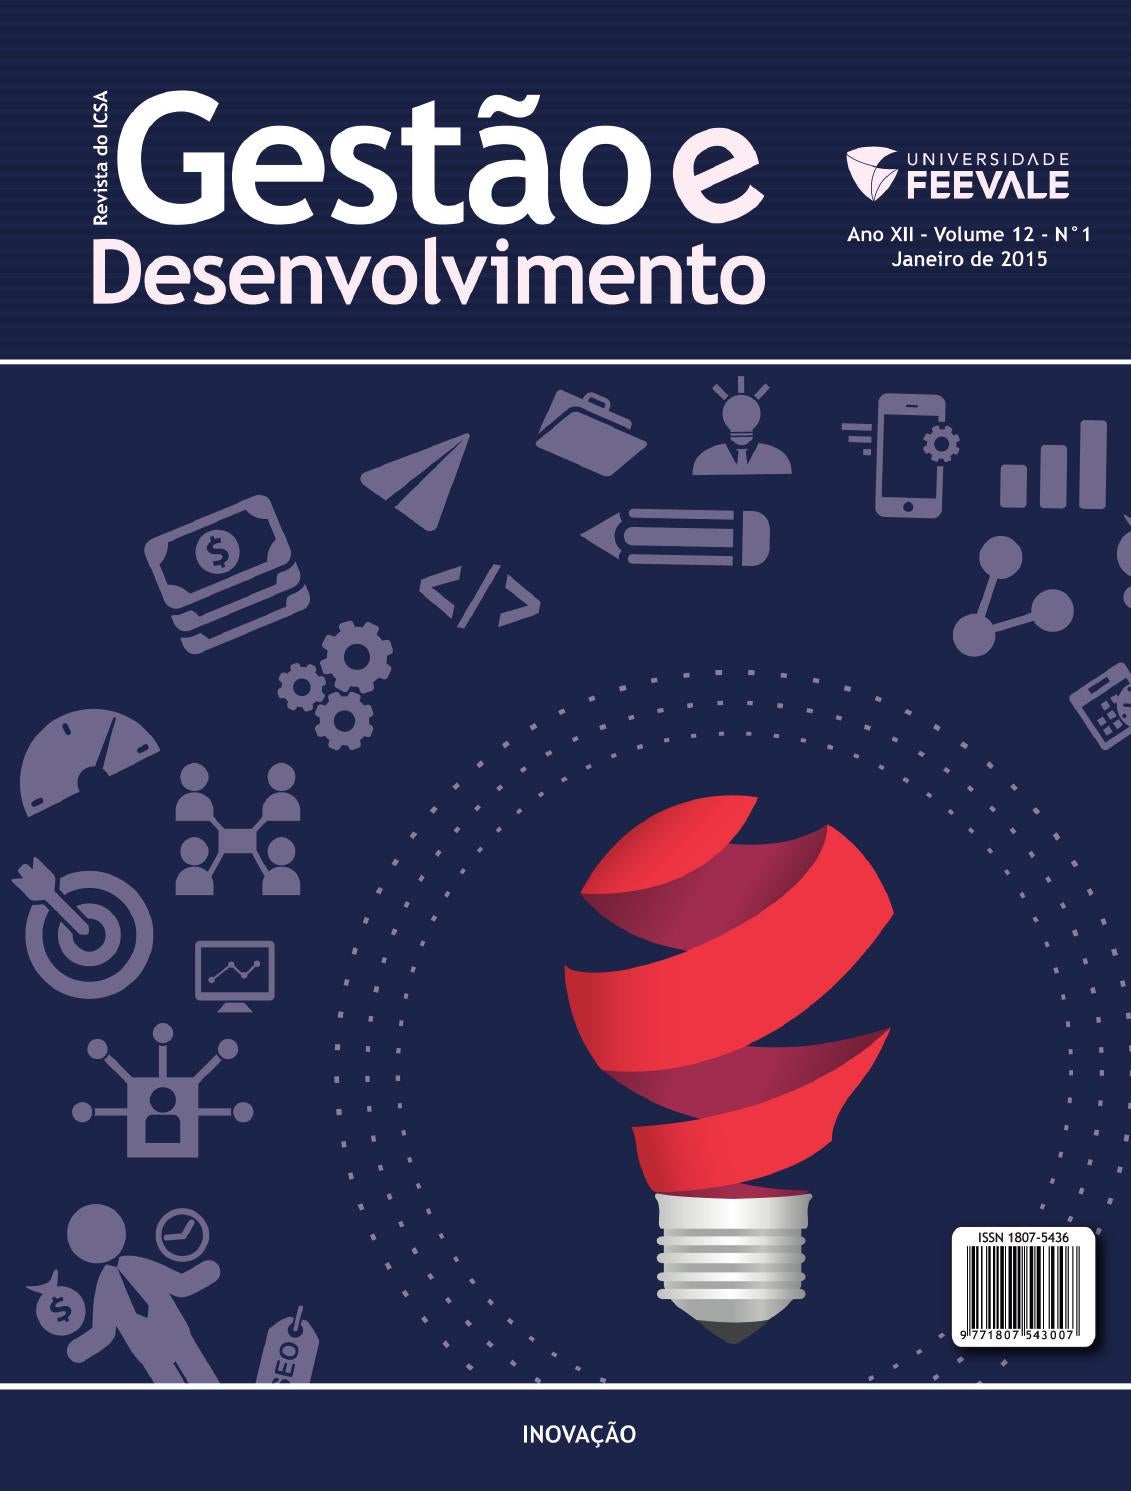 Revista gesto e desenvolvimento janeiro 2015 by universidade revista gesto e desenvolvimento janeiro 2015 by universidade feevale issuu fandeluxe Image collections